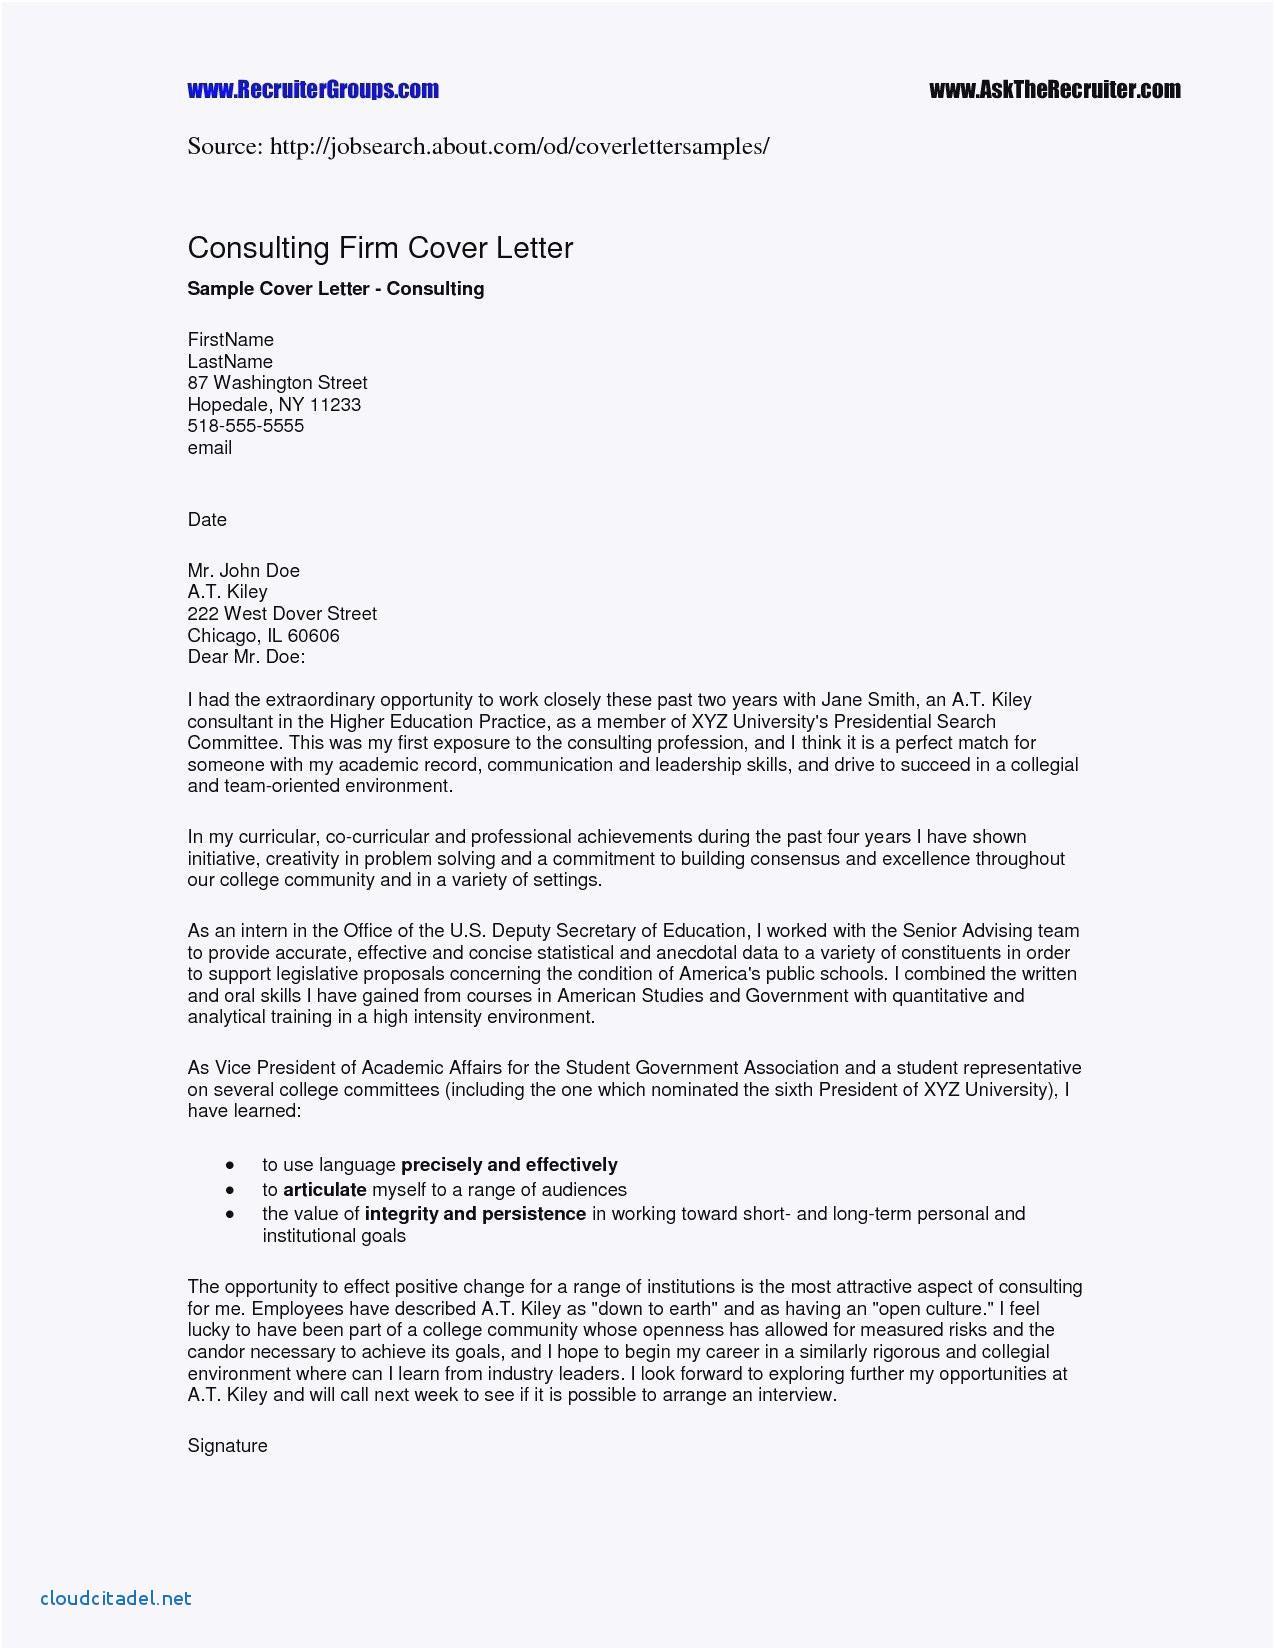 609 Dispute Letter Template - Elegant Letter Sample format Doc